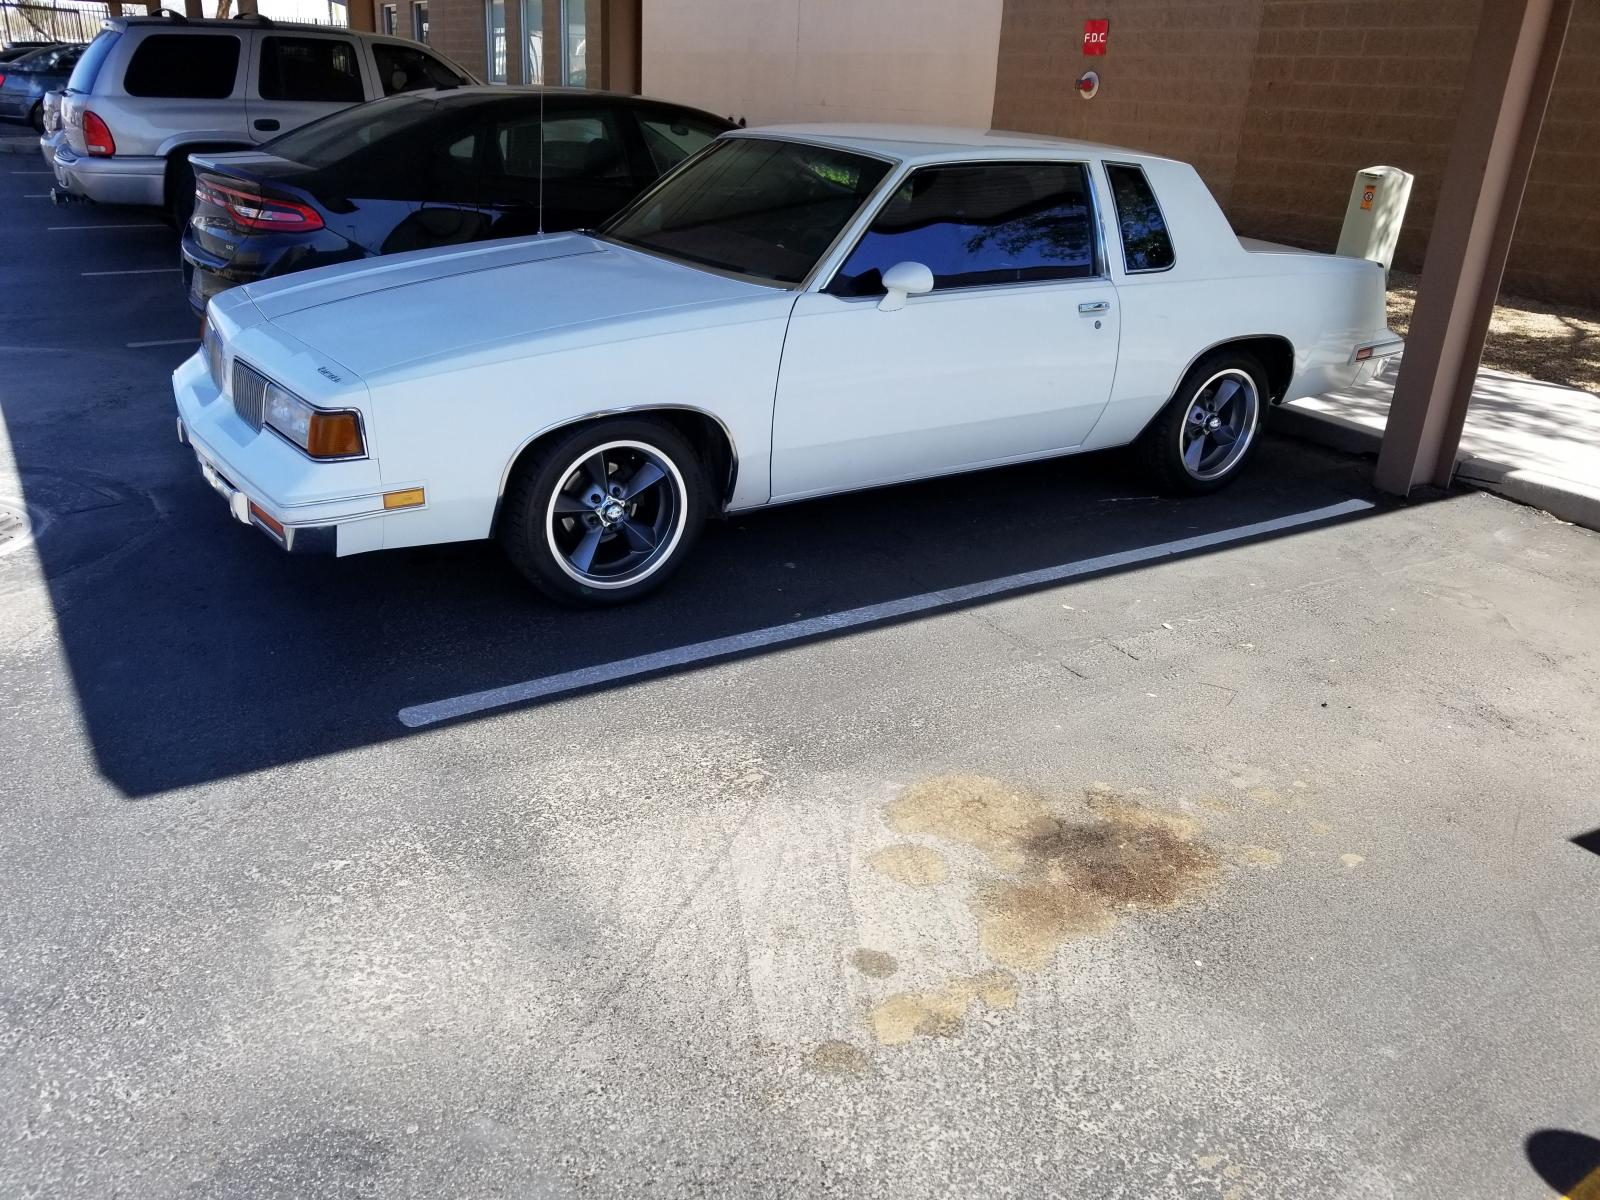 87 Oldsmobile Cutlass Supreme